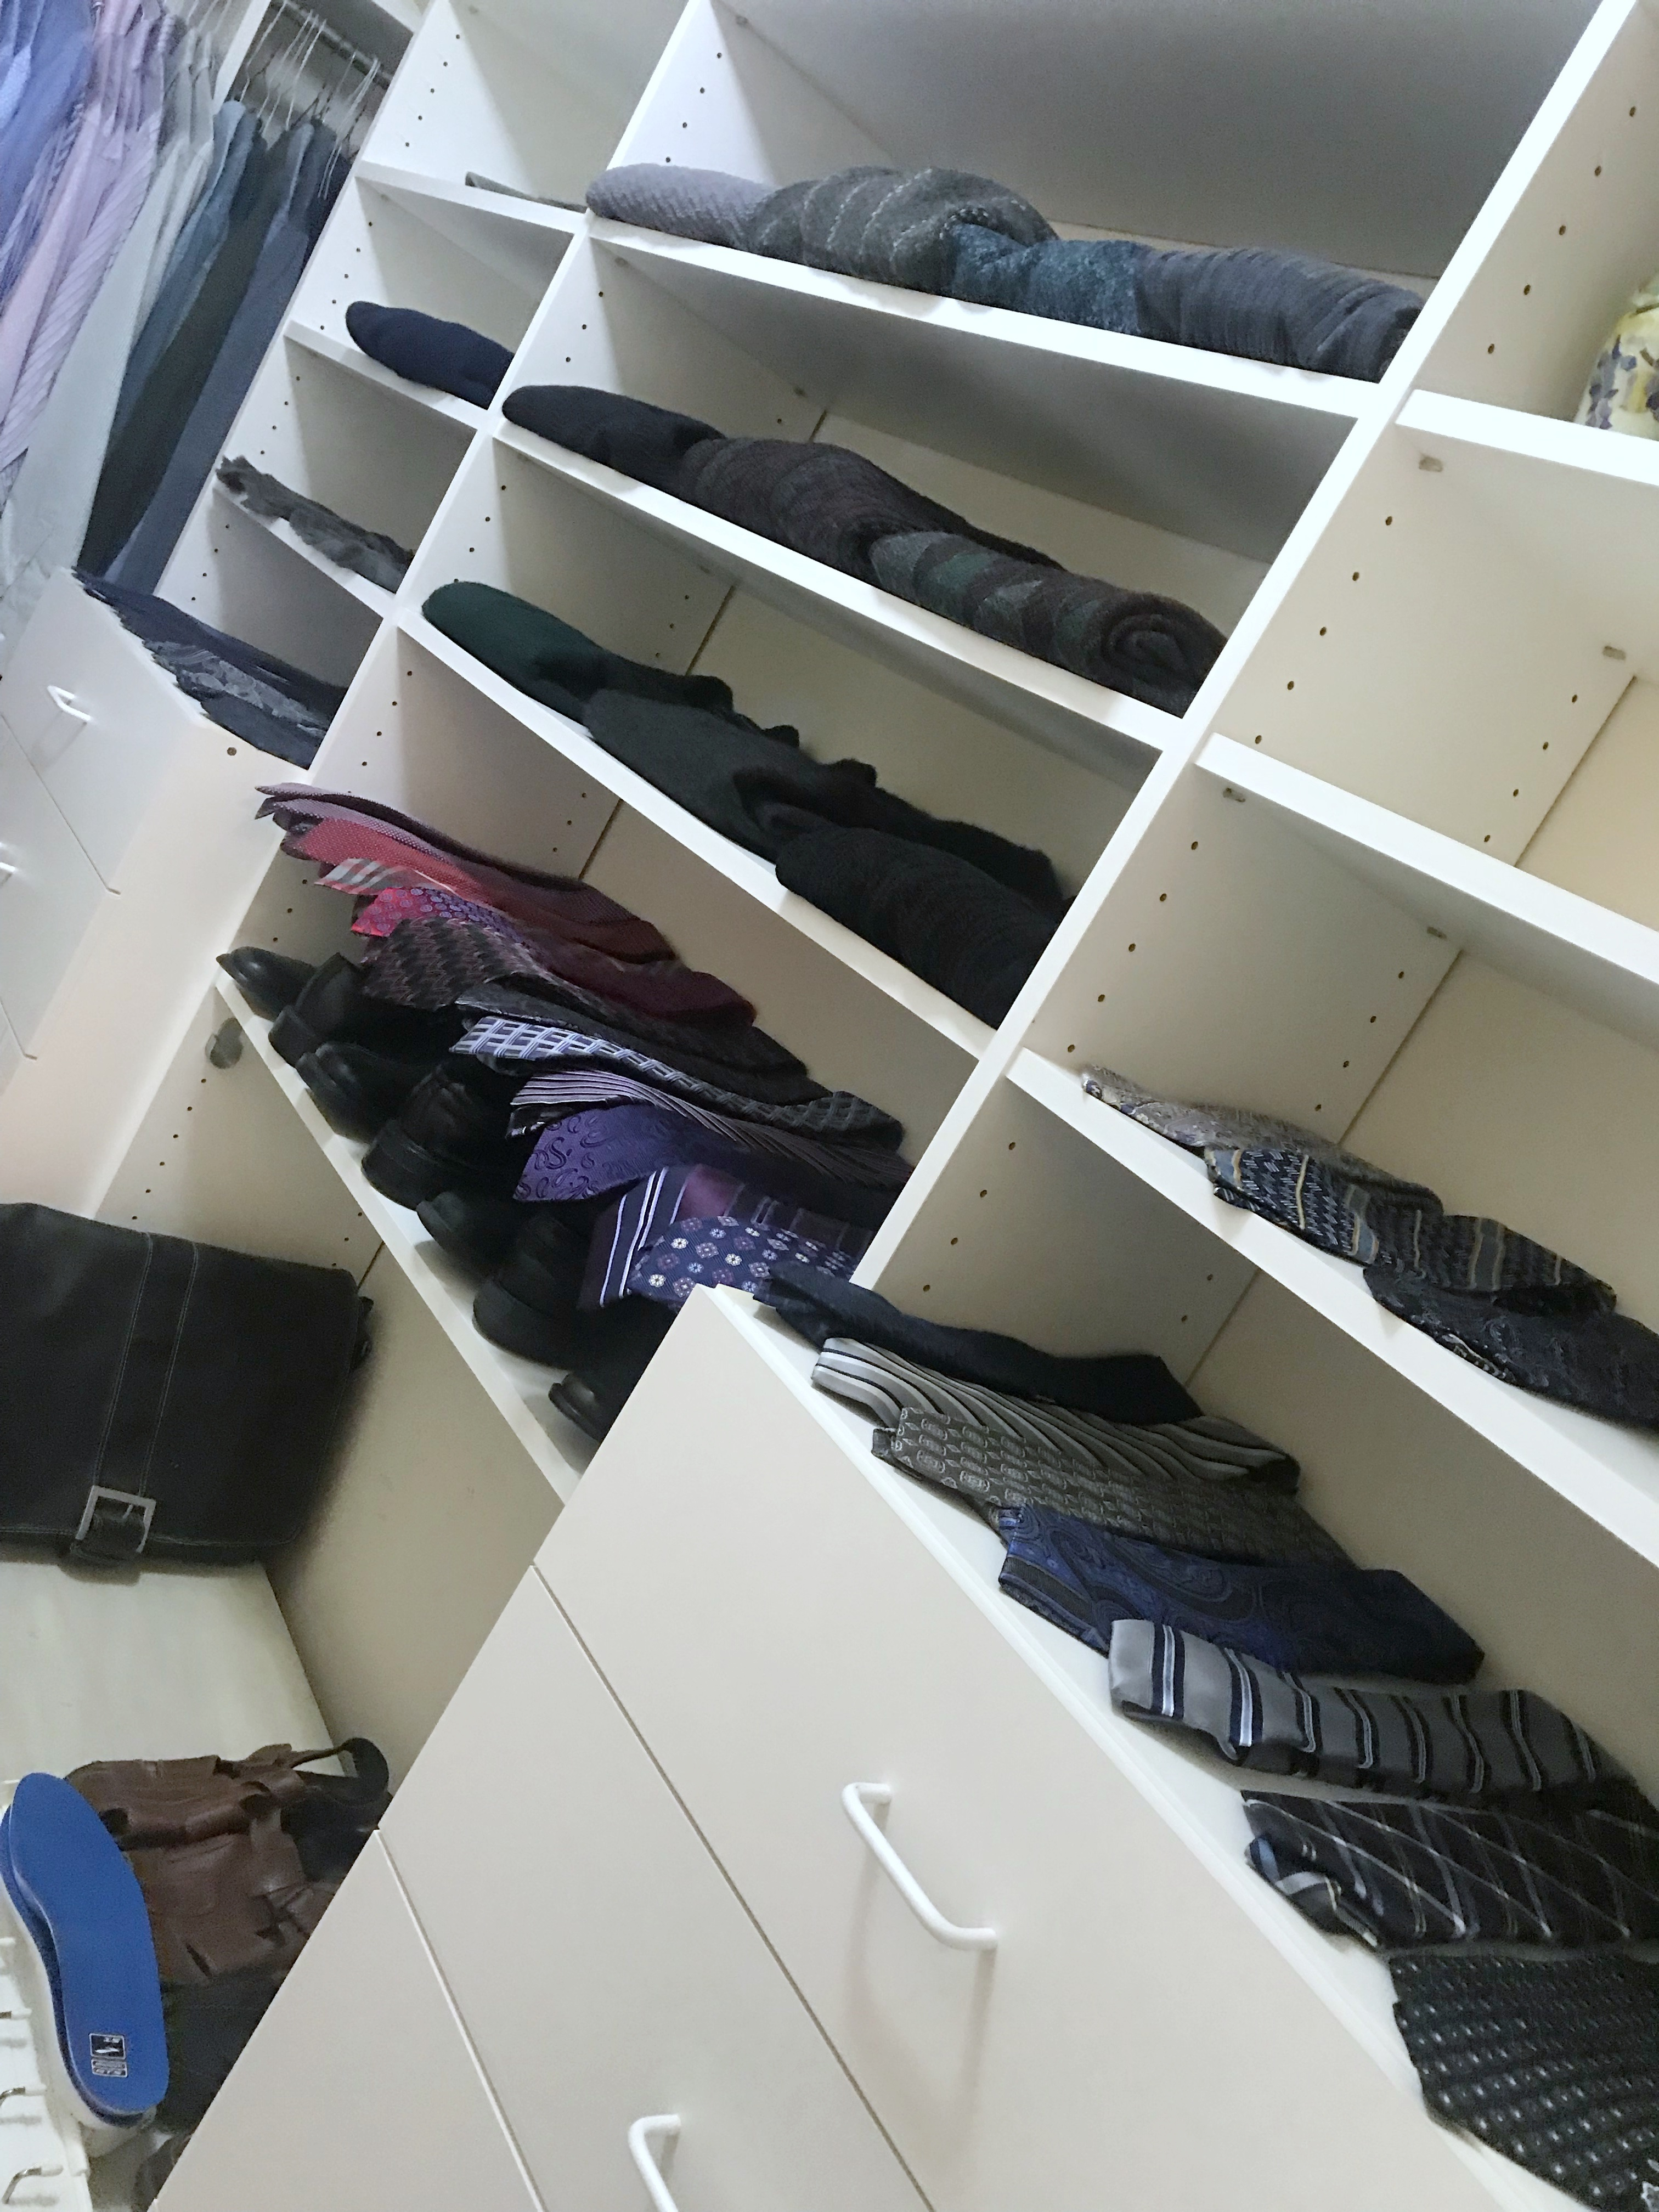 Men's professional closet makeover, closet edit, tie shelves, tie organization, tie closet